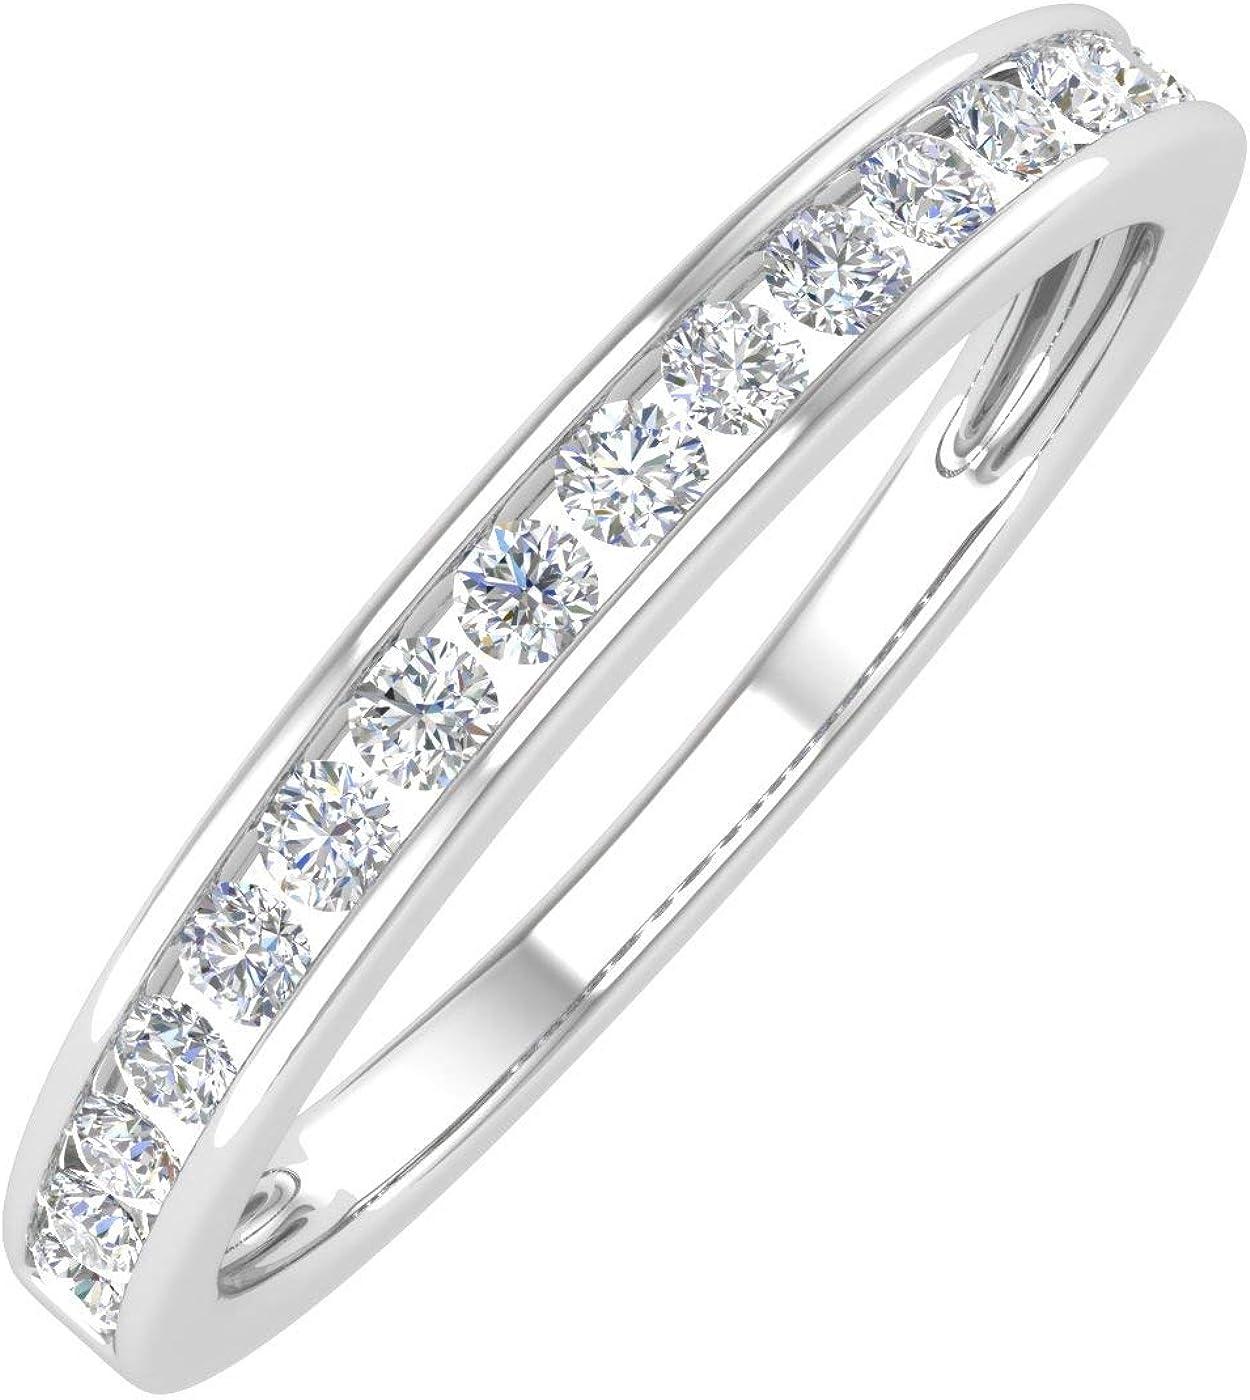 1/4 Carat Channel Set Diamond Ladies Anniversary Wedding Band in 10K Gold